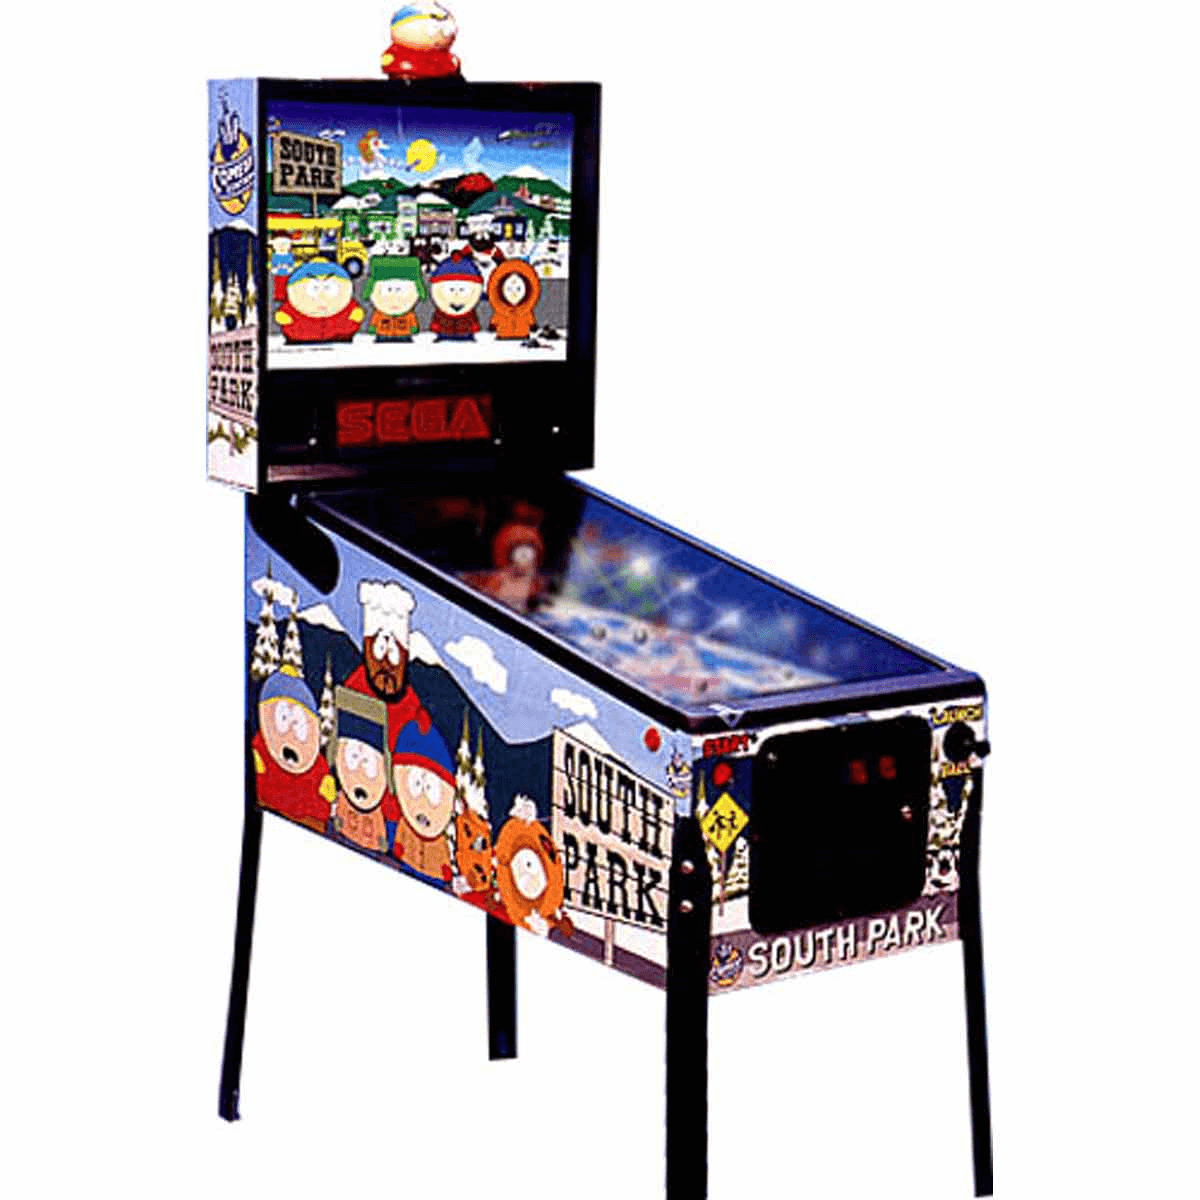 Buy south park pinball machine online at 5999 for Pinball de mesa